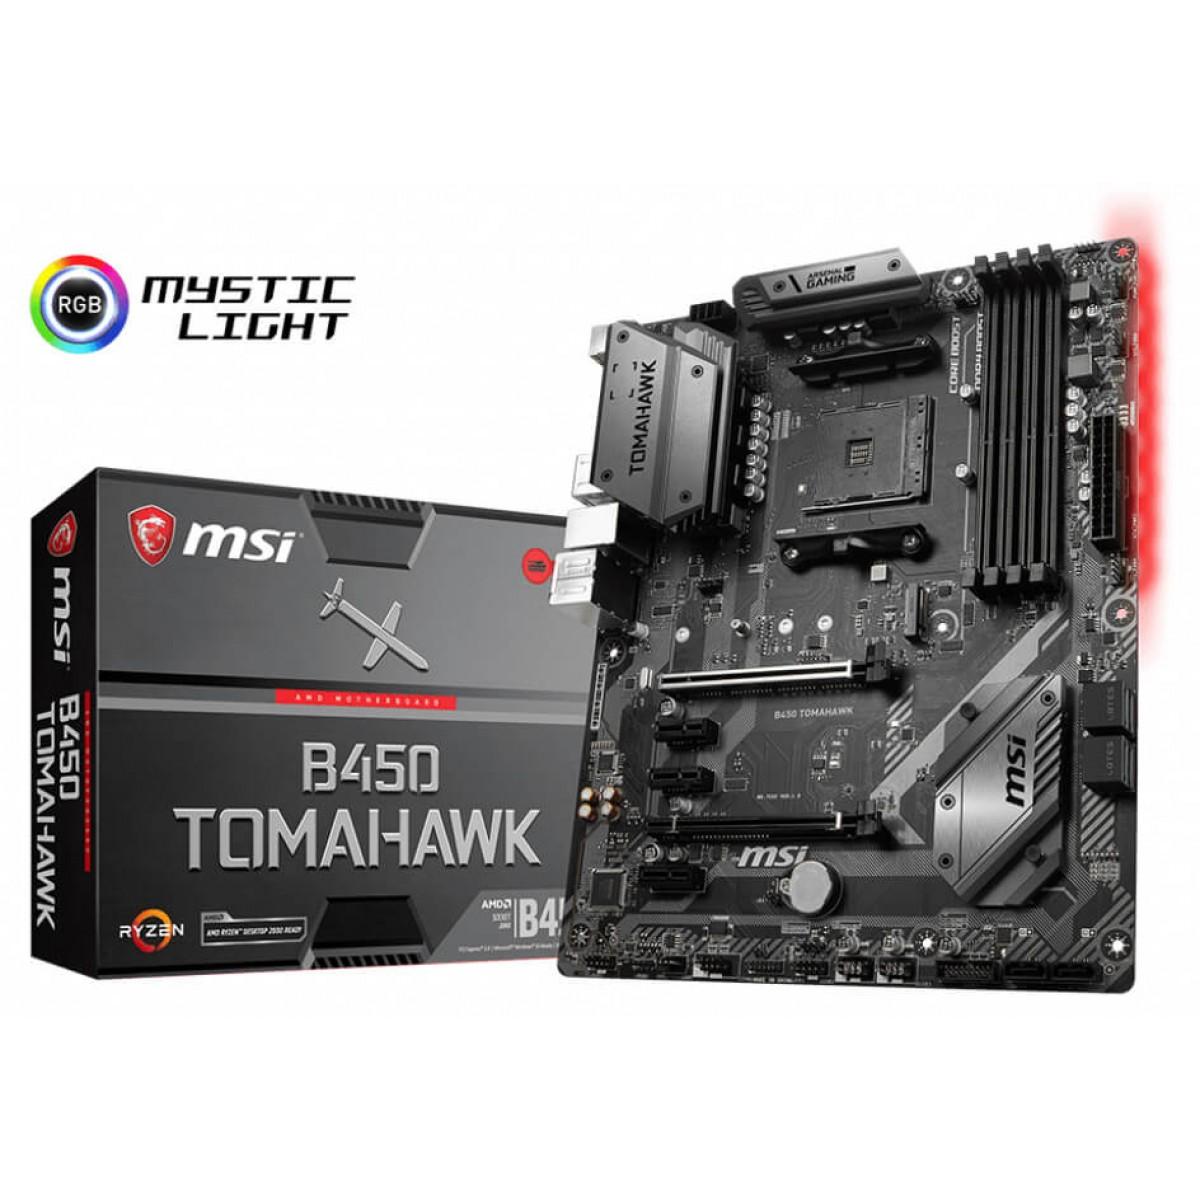 Placa Mãe MSI B450 Tomahawk, Chipset B450, AMD AM4, ATX, DDR4